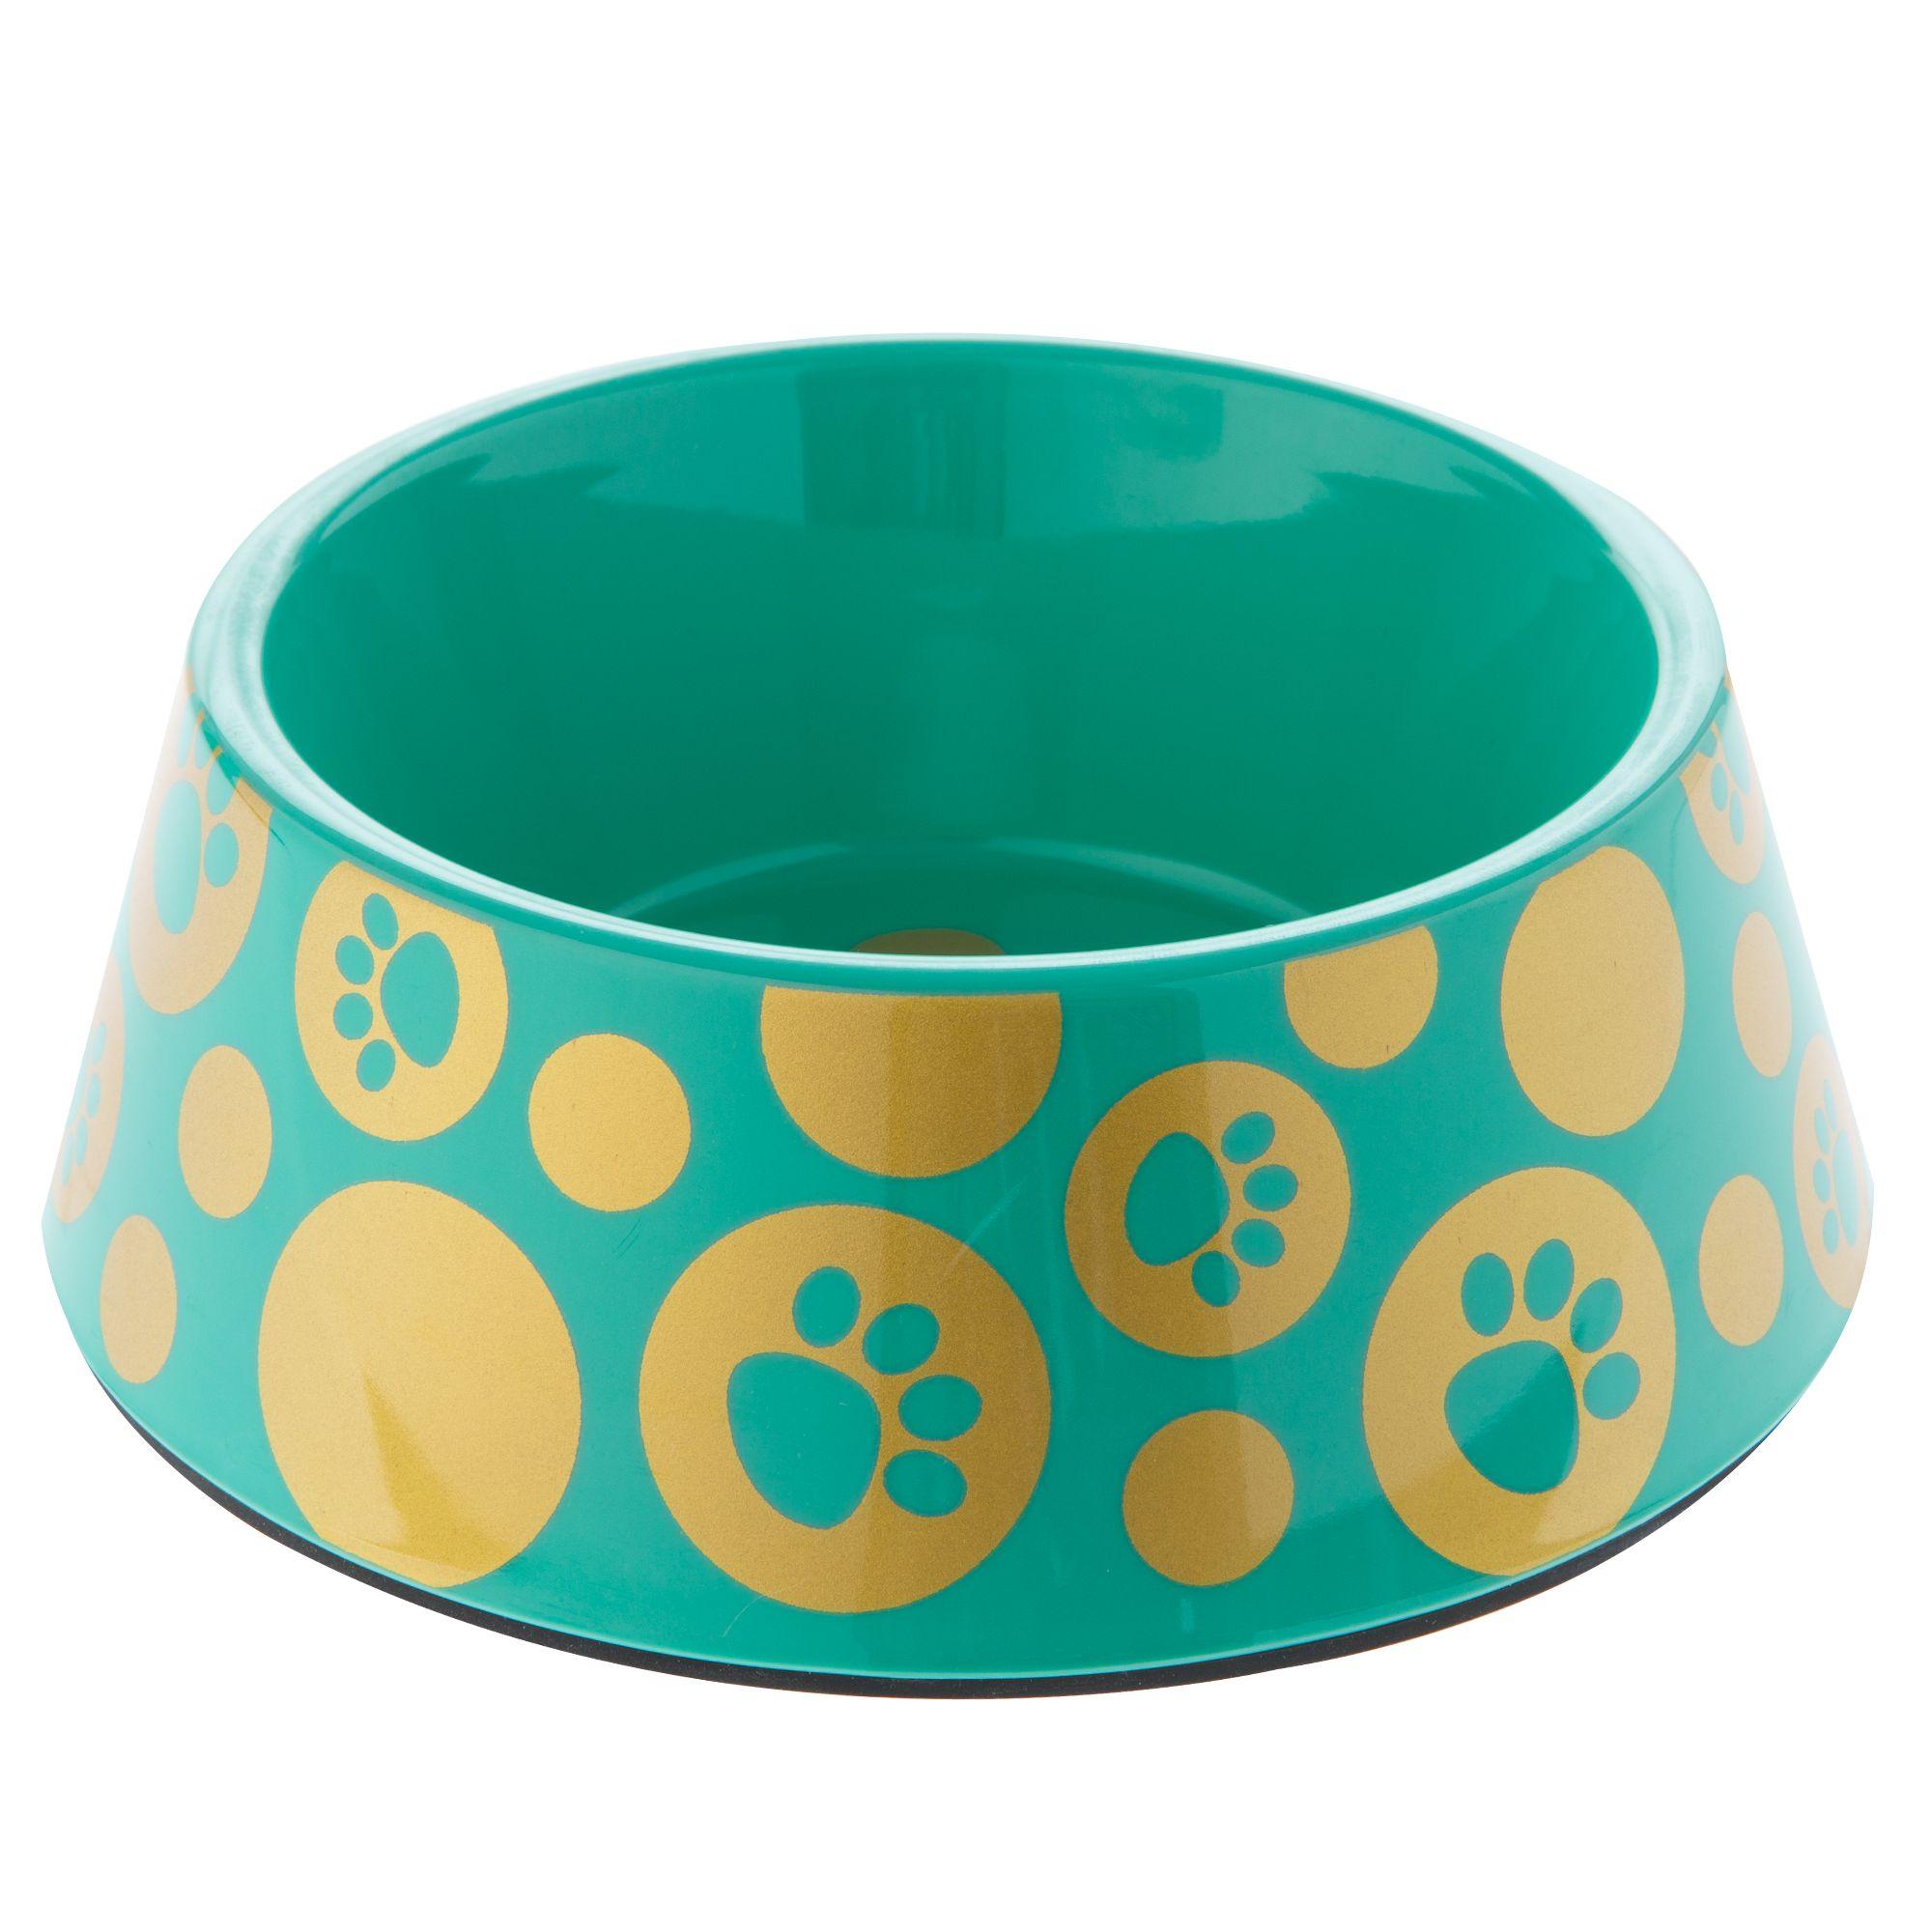 Top Paw Glitz Paws Dog Bowl size: 1.5 C, Turquoise 5250221